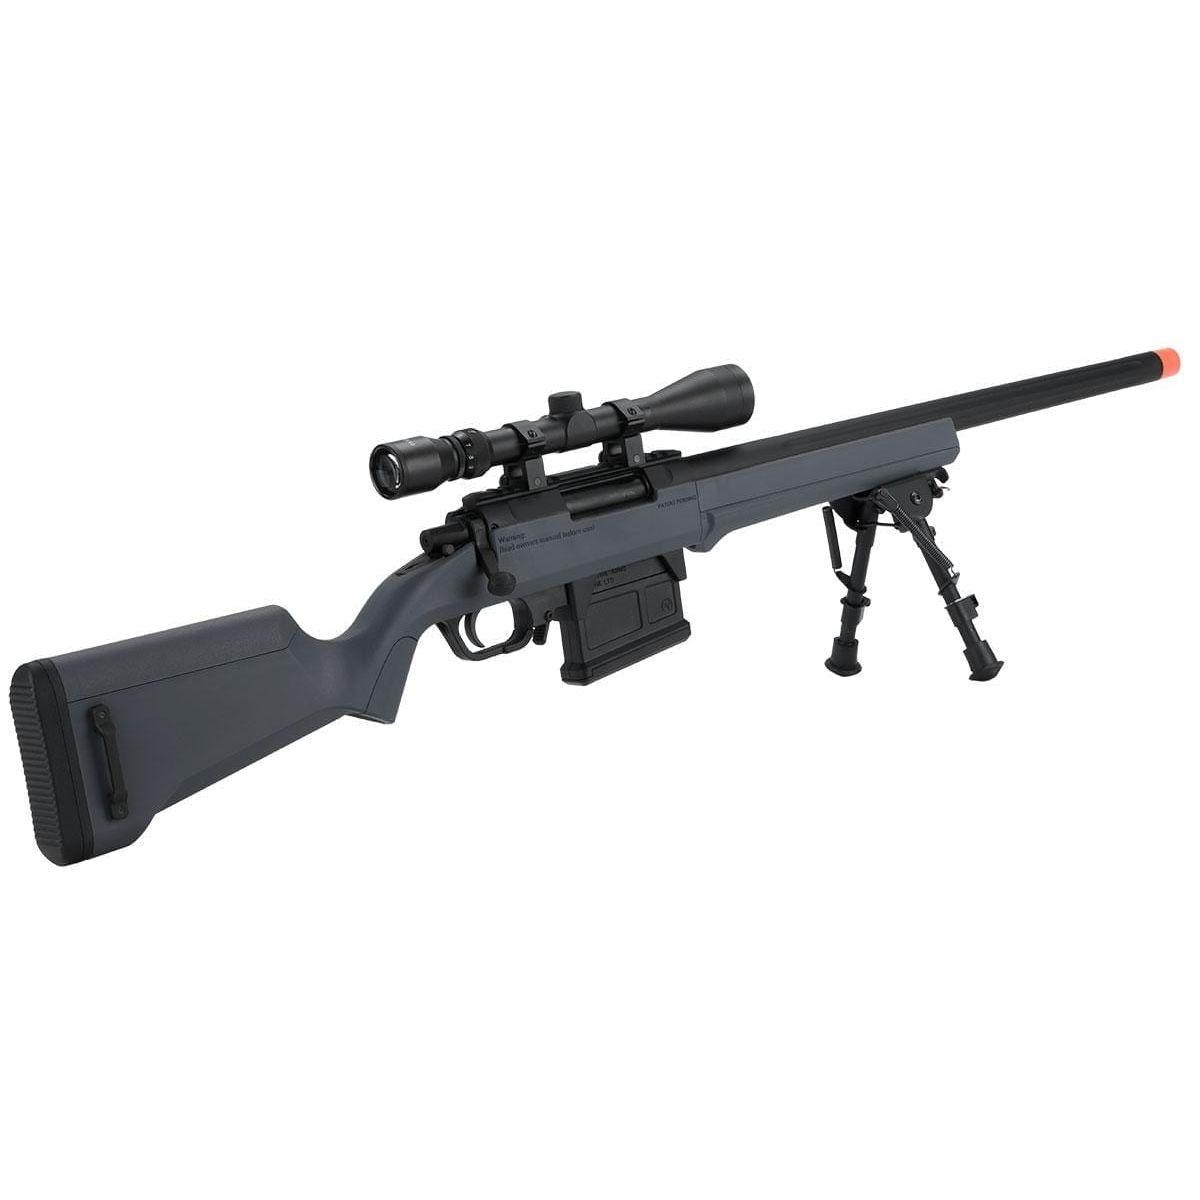 S1 Gen2 Bolt Action Sniper Rifle grey amoeba